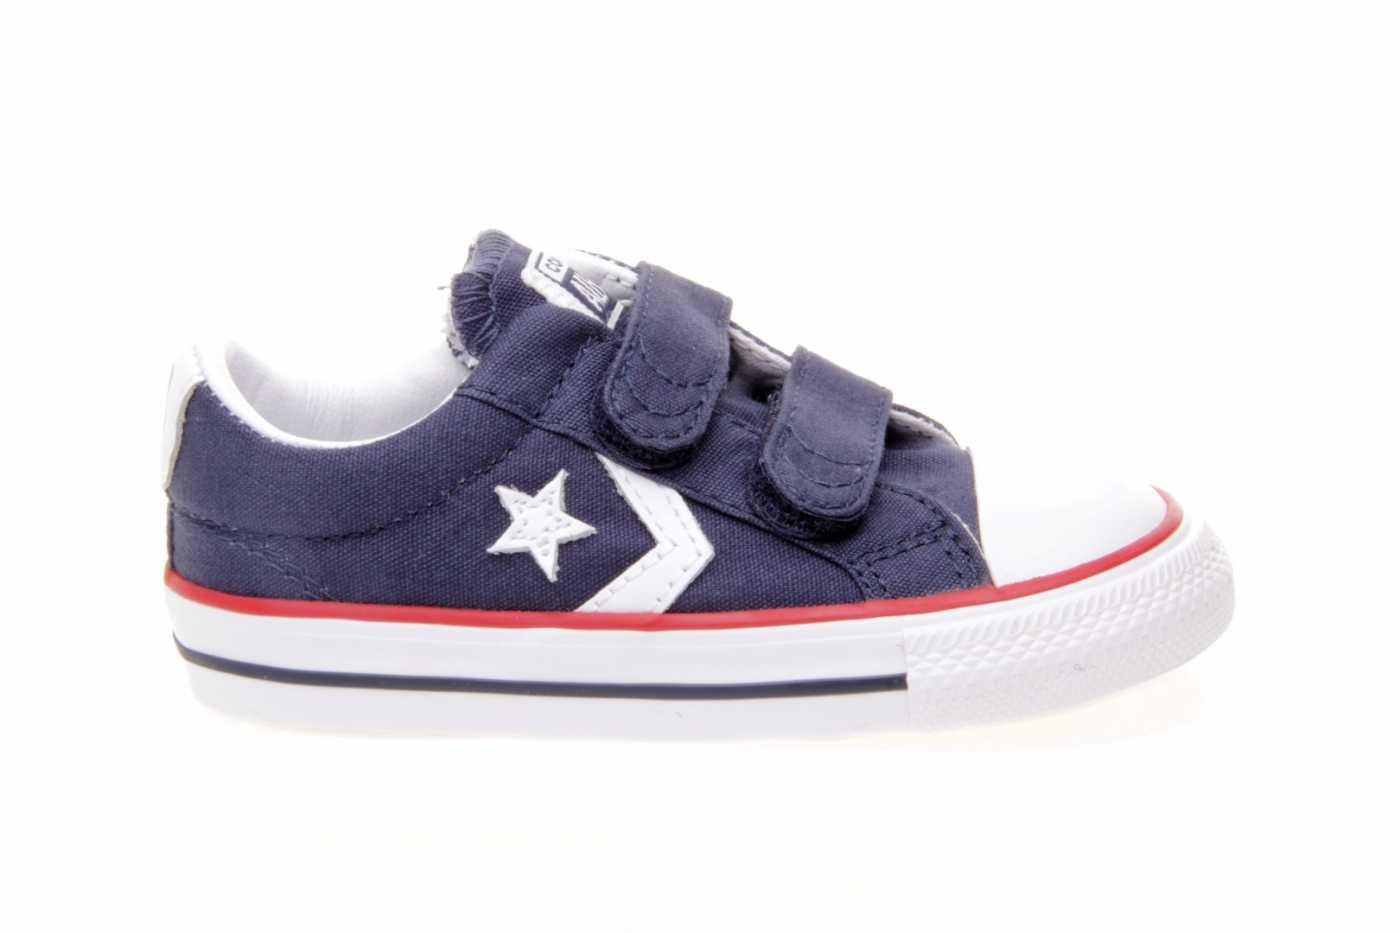 745c6e6870a1a Comprar zapato tipo JOVEN NIÑO estilo LONA COLOR AZUL LONA